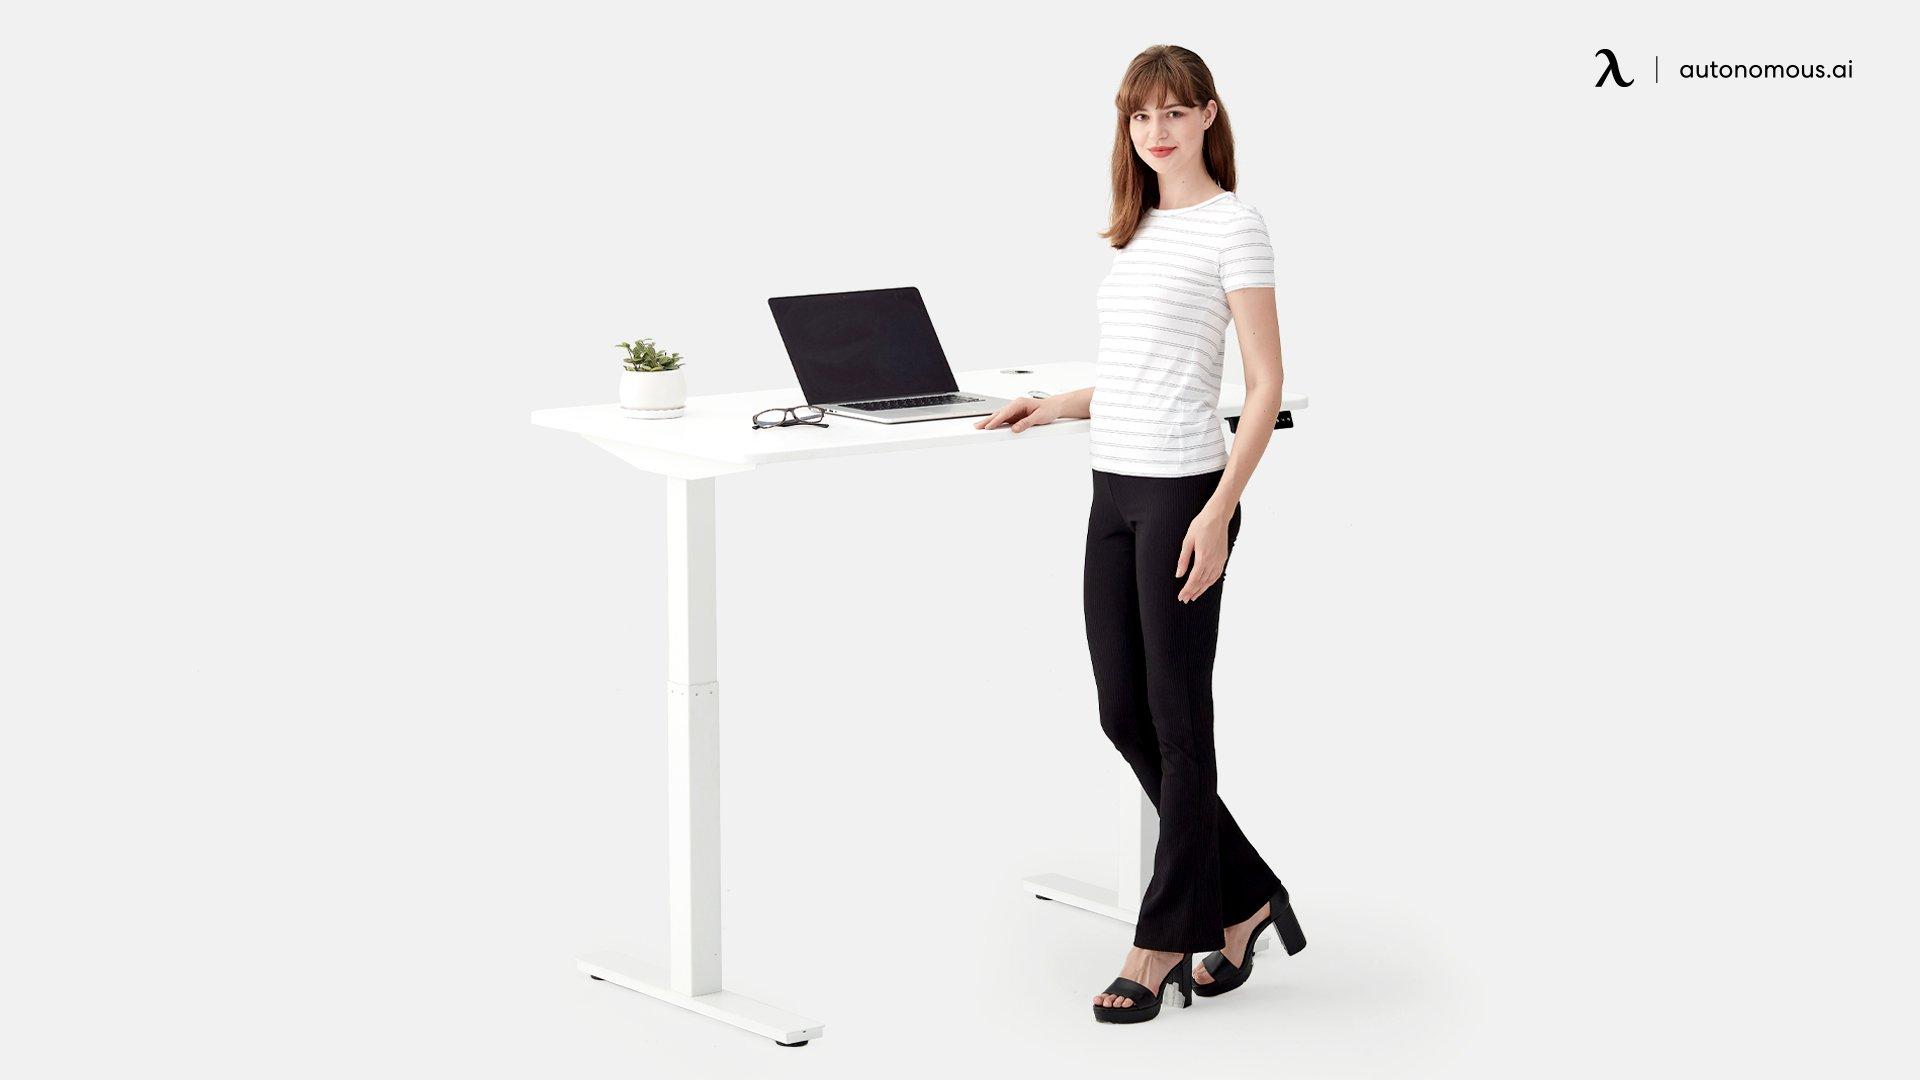 the SmartDesk 2 Premium